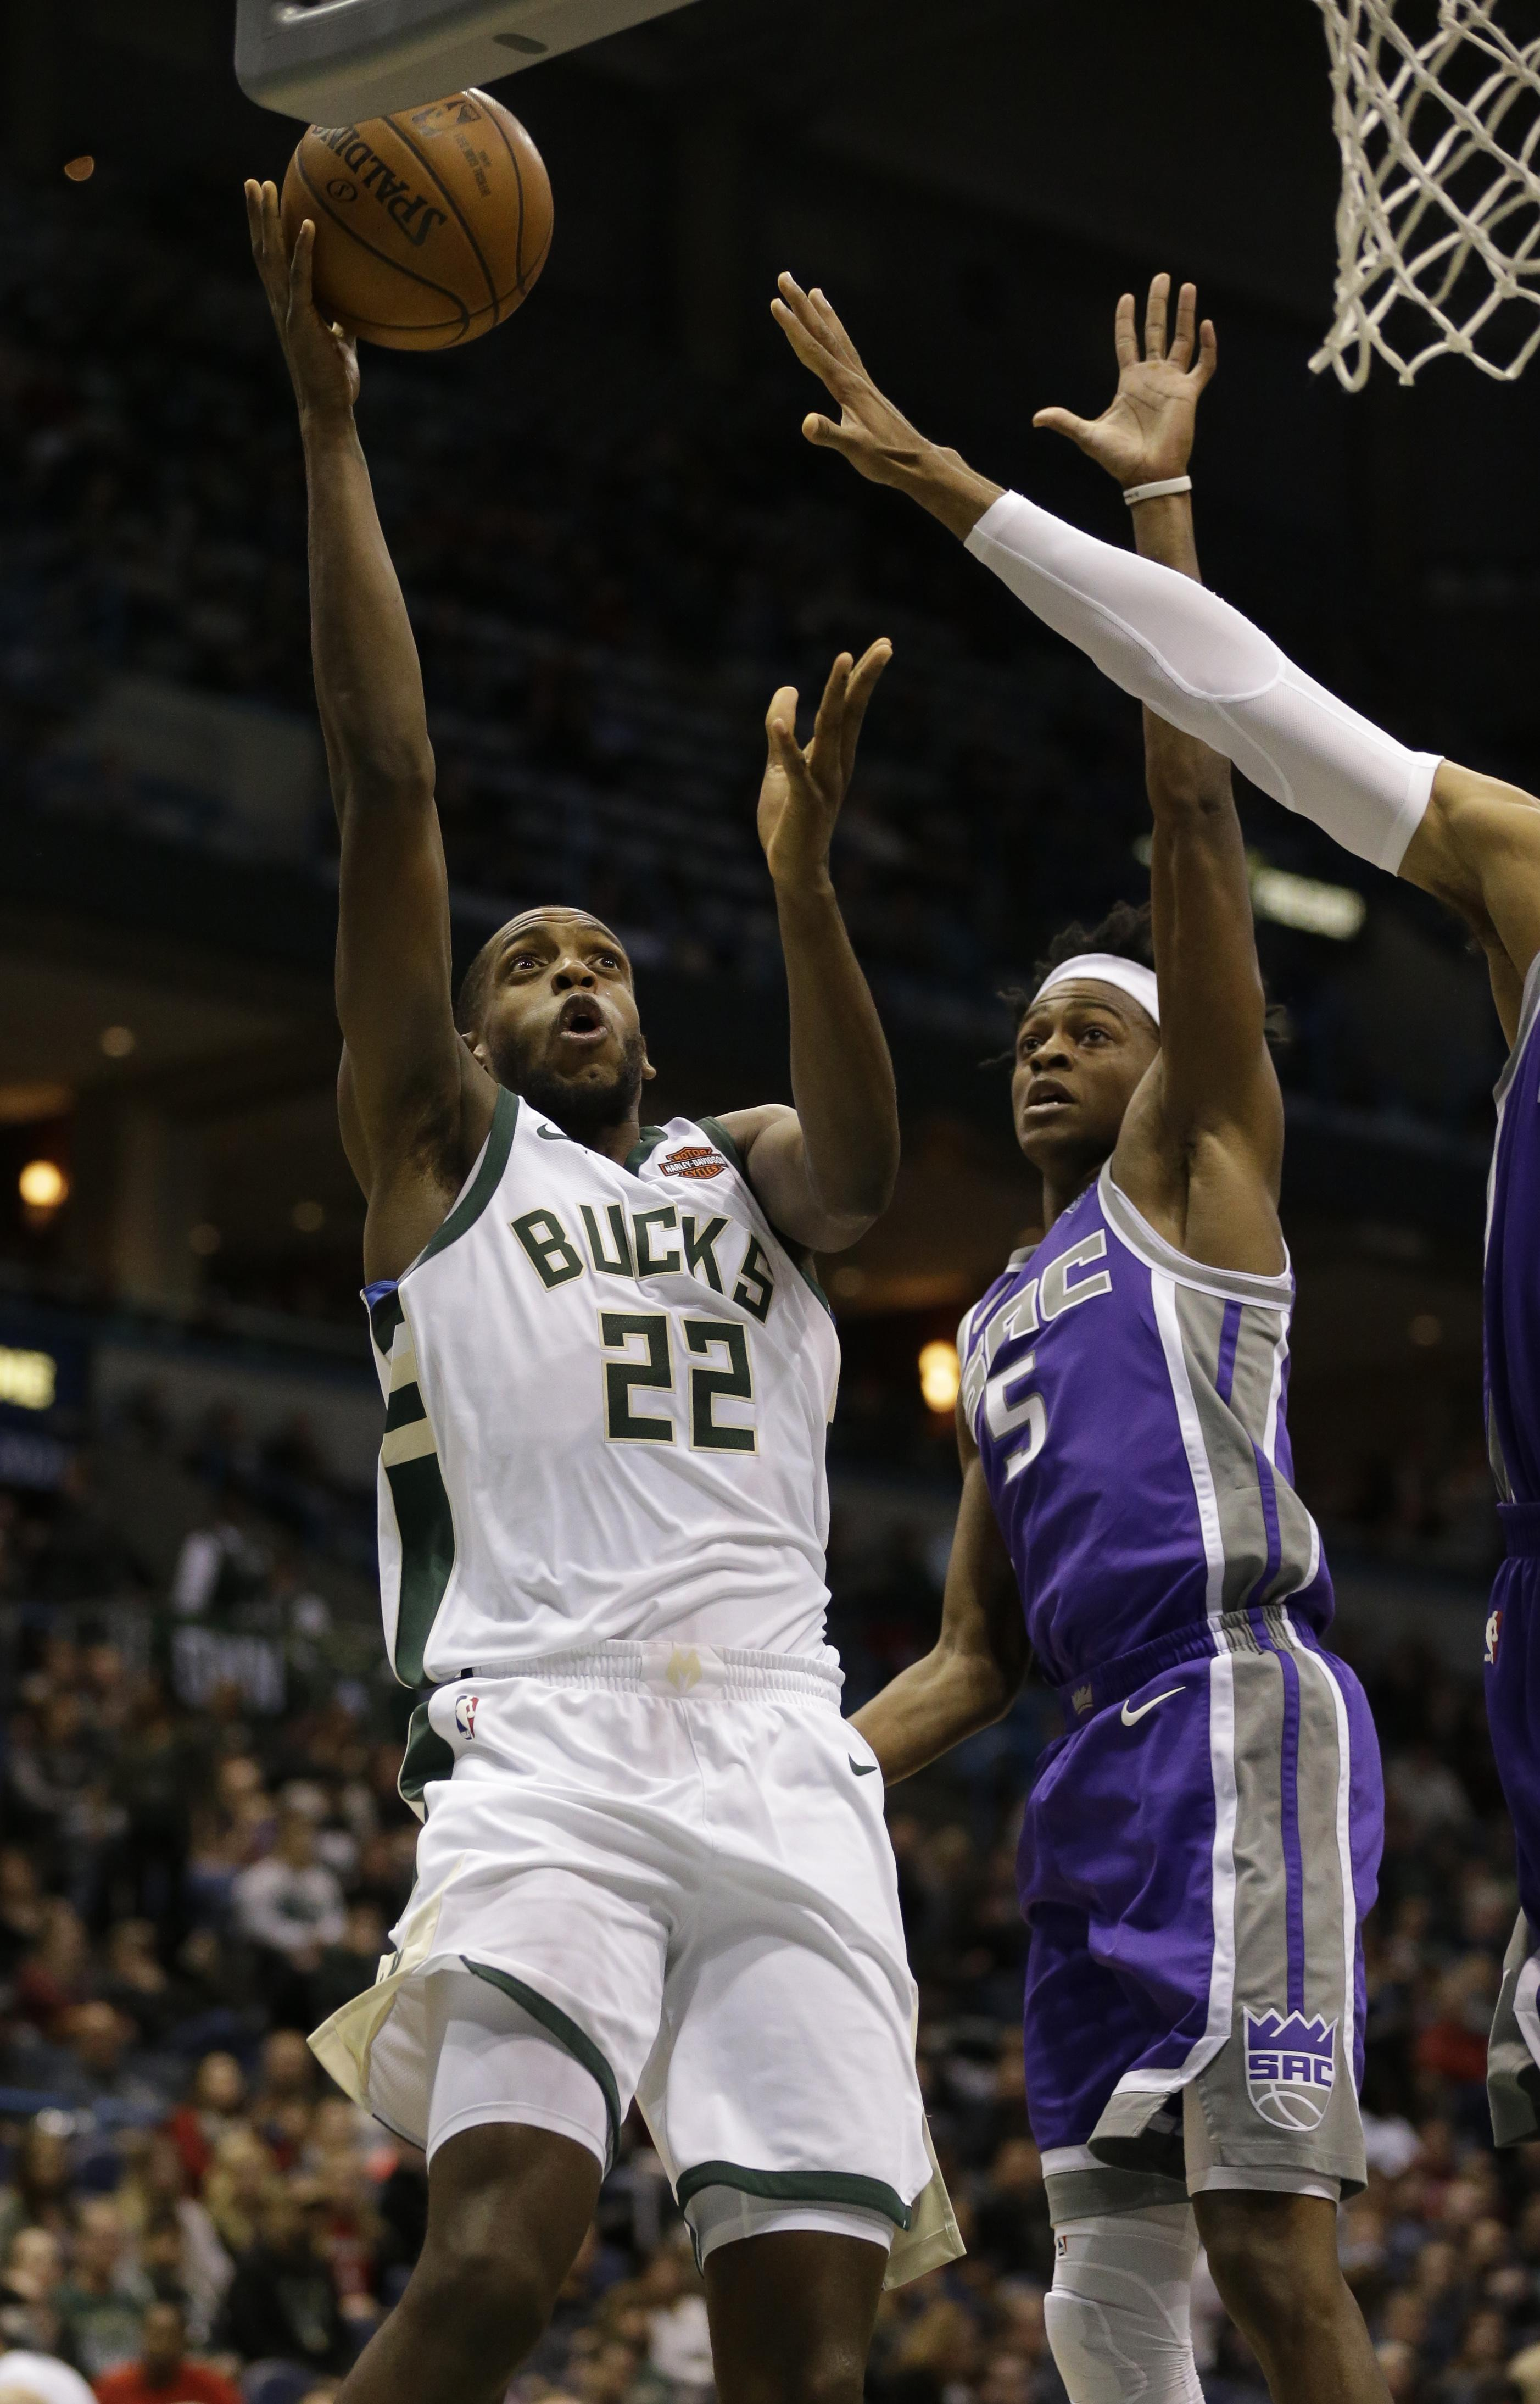 Kings_bucks_basketball_82324